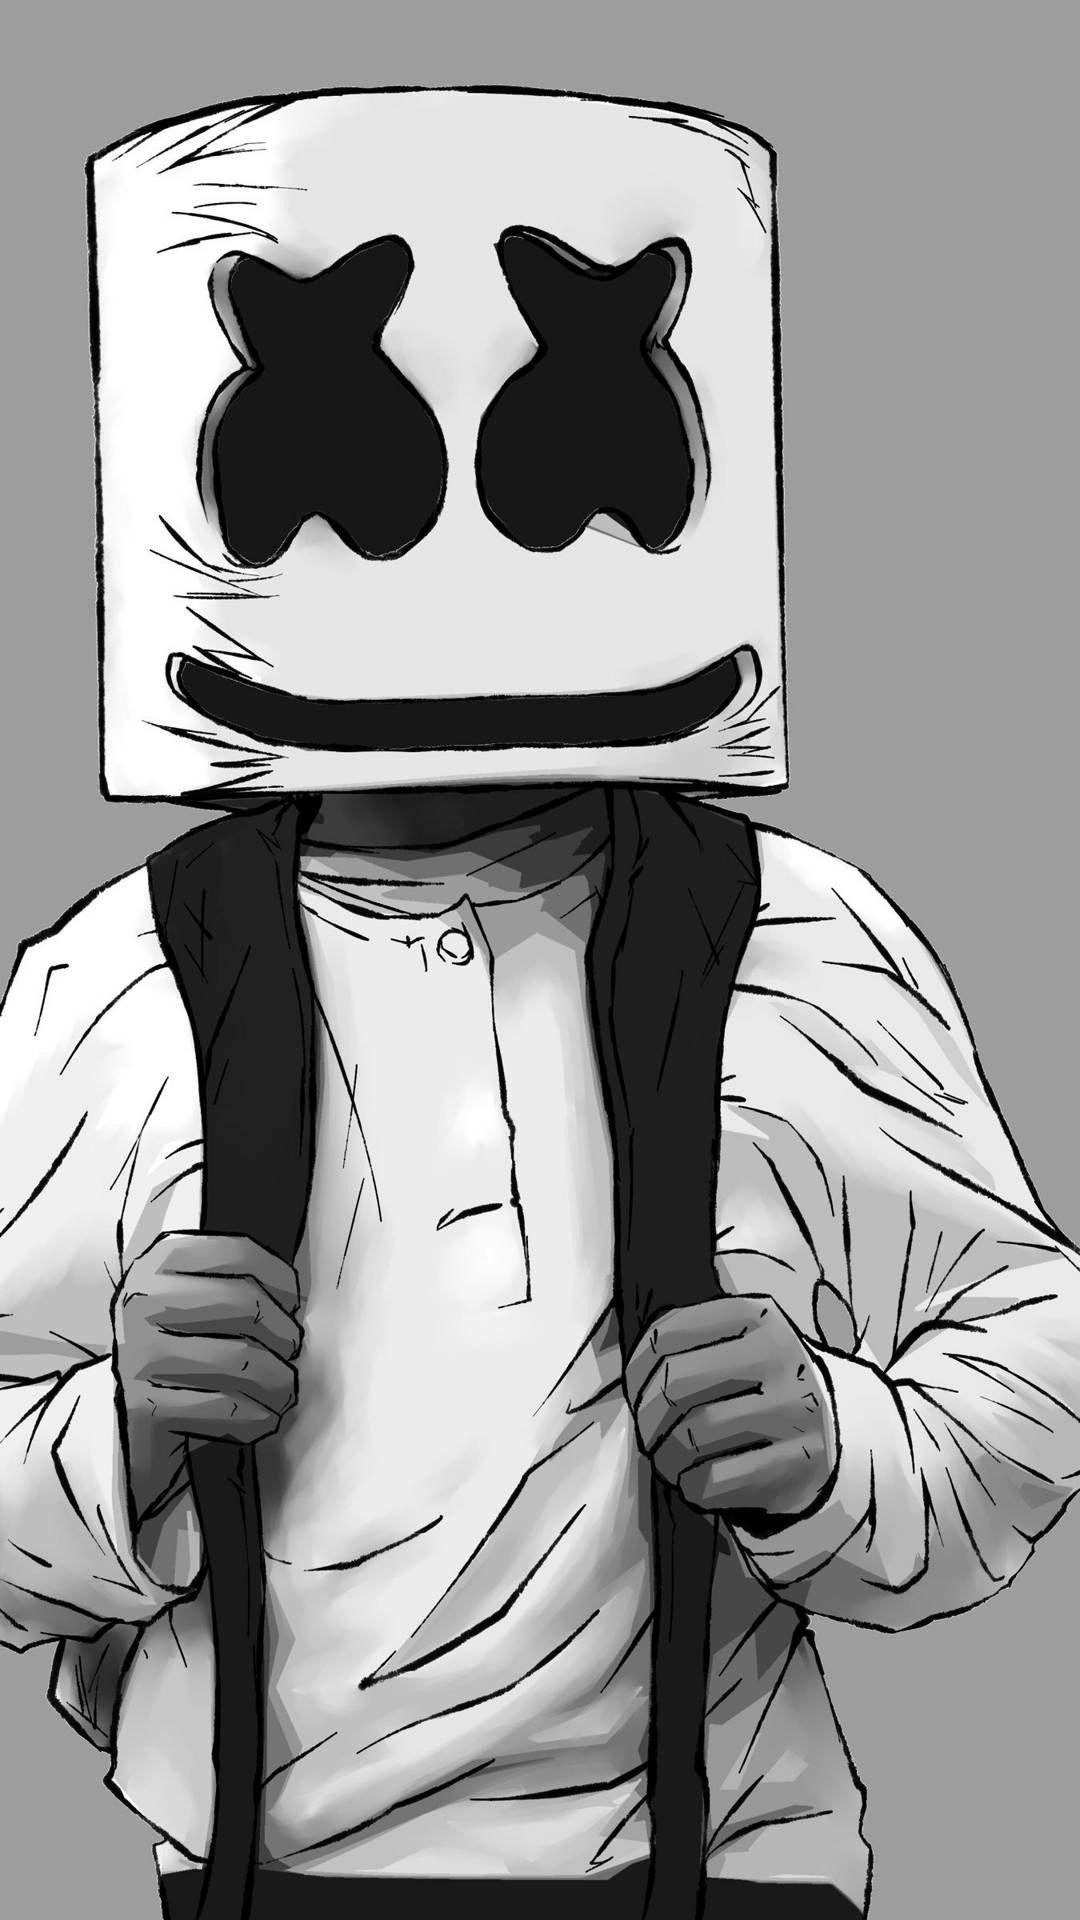 Marshmallo Fond D Ecran Dessin Dessin De Musique Fond D Ecran Jeux